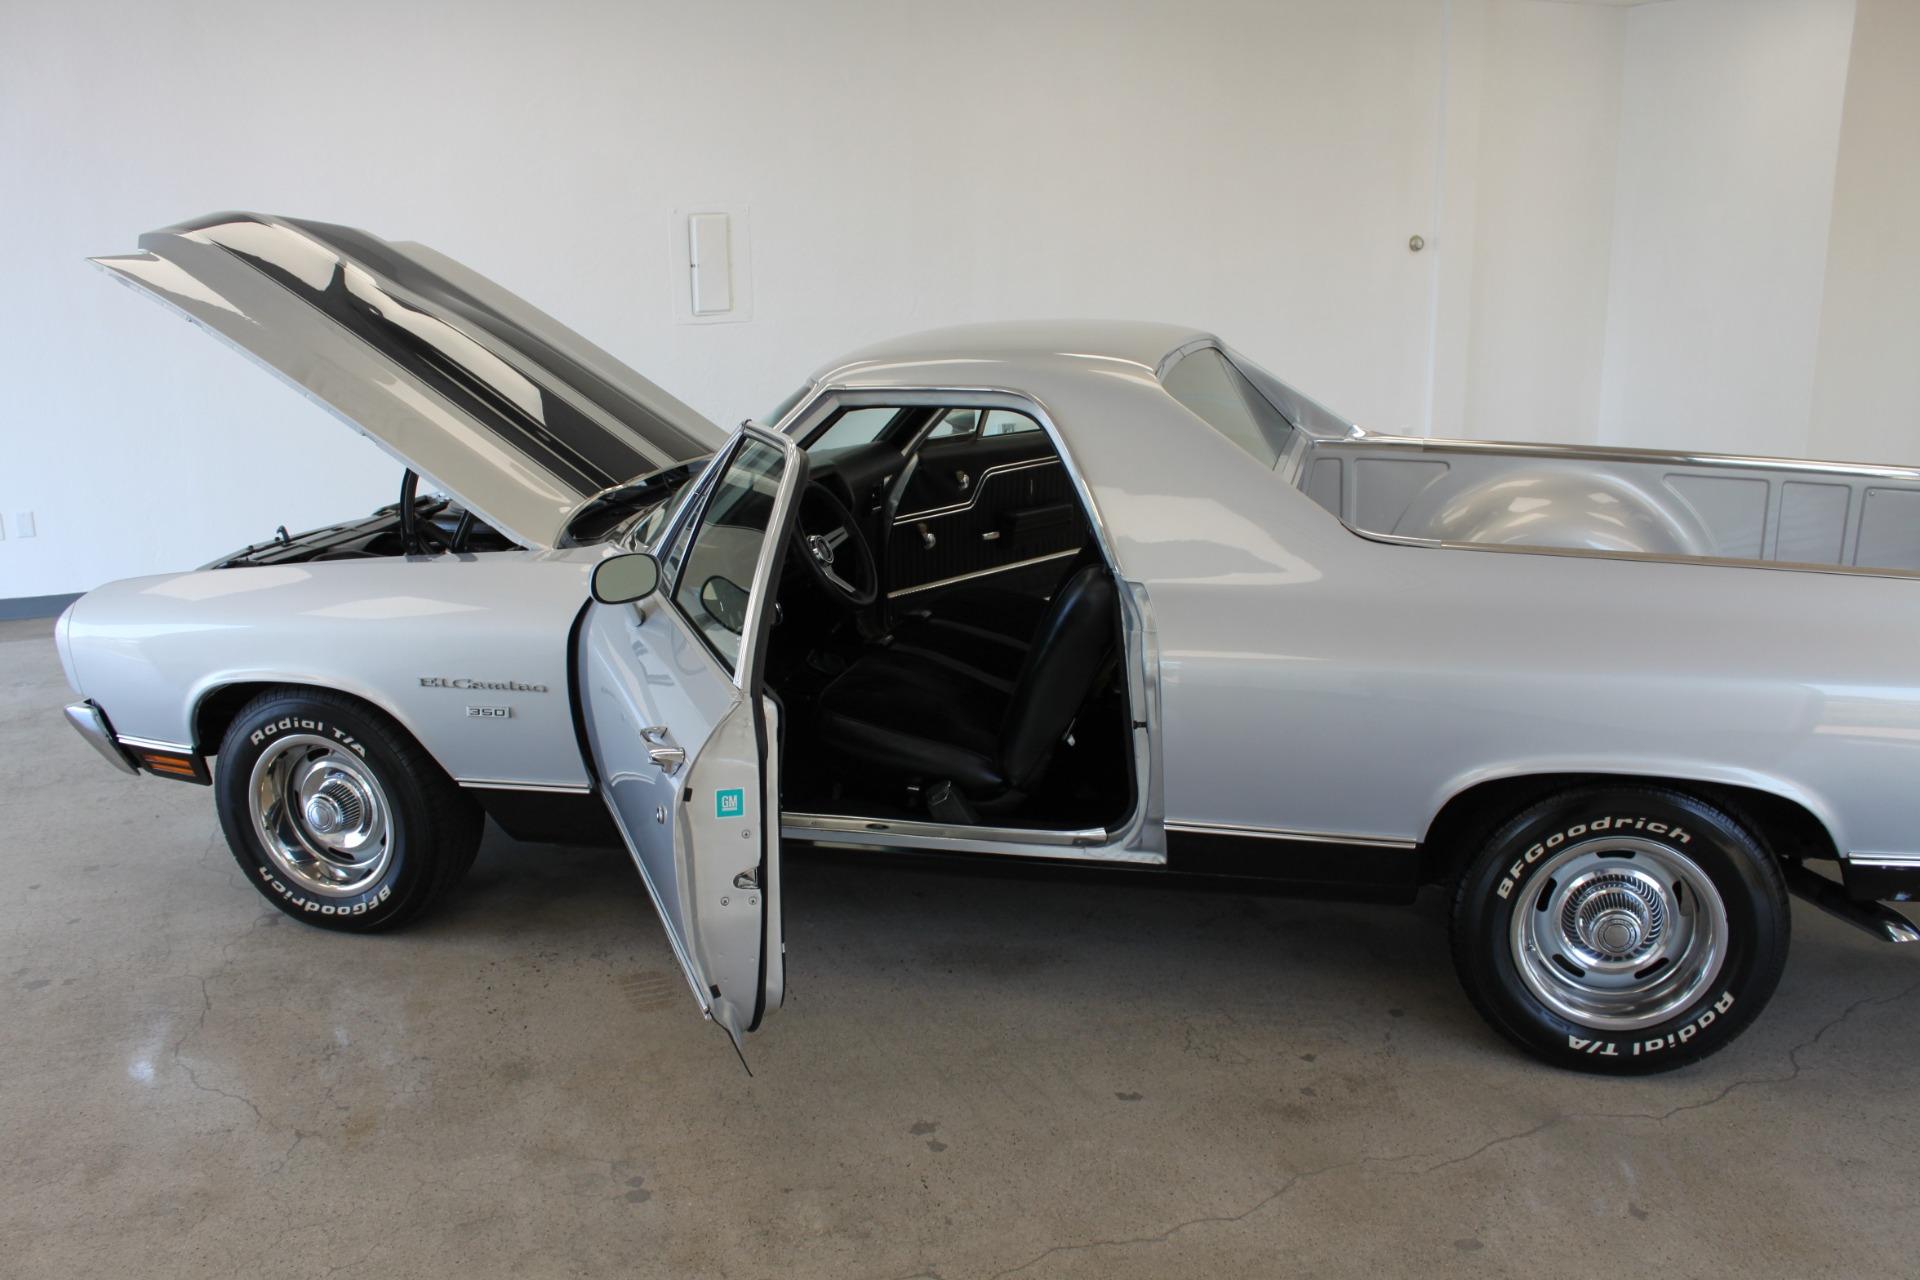 Used-1970-Chevrolet-El-Camino-Custom-350-ci-Ferrari